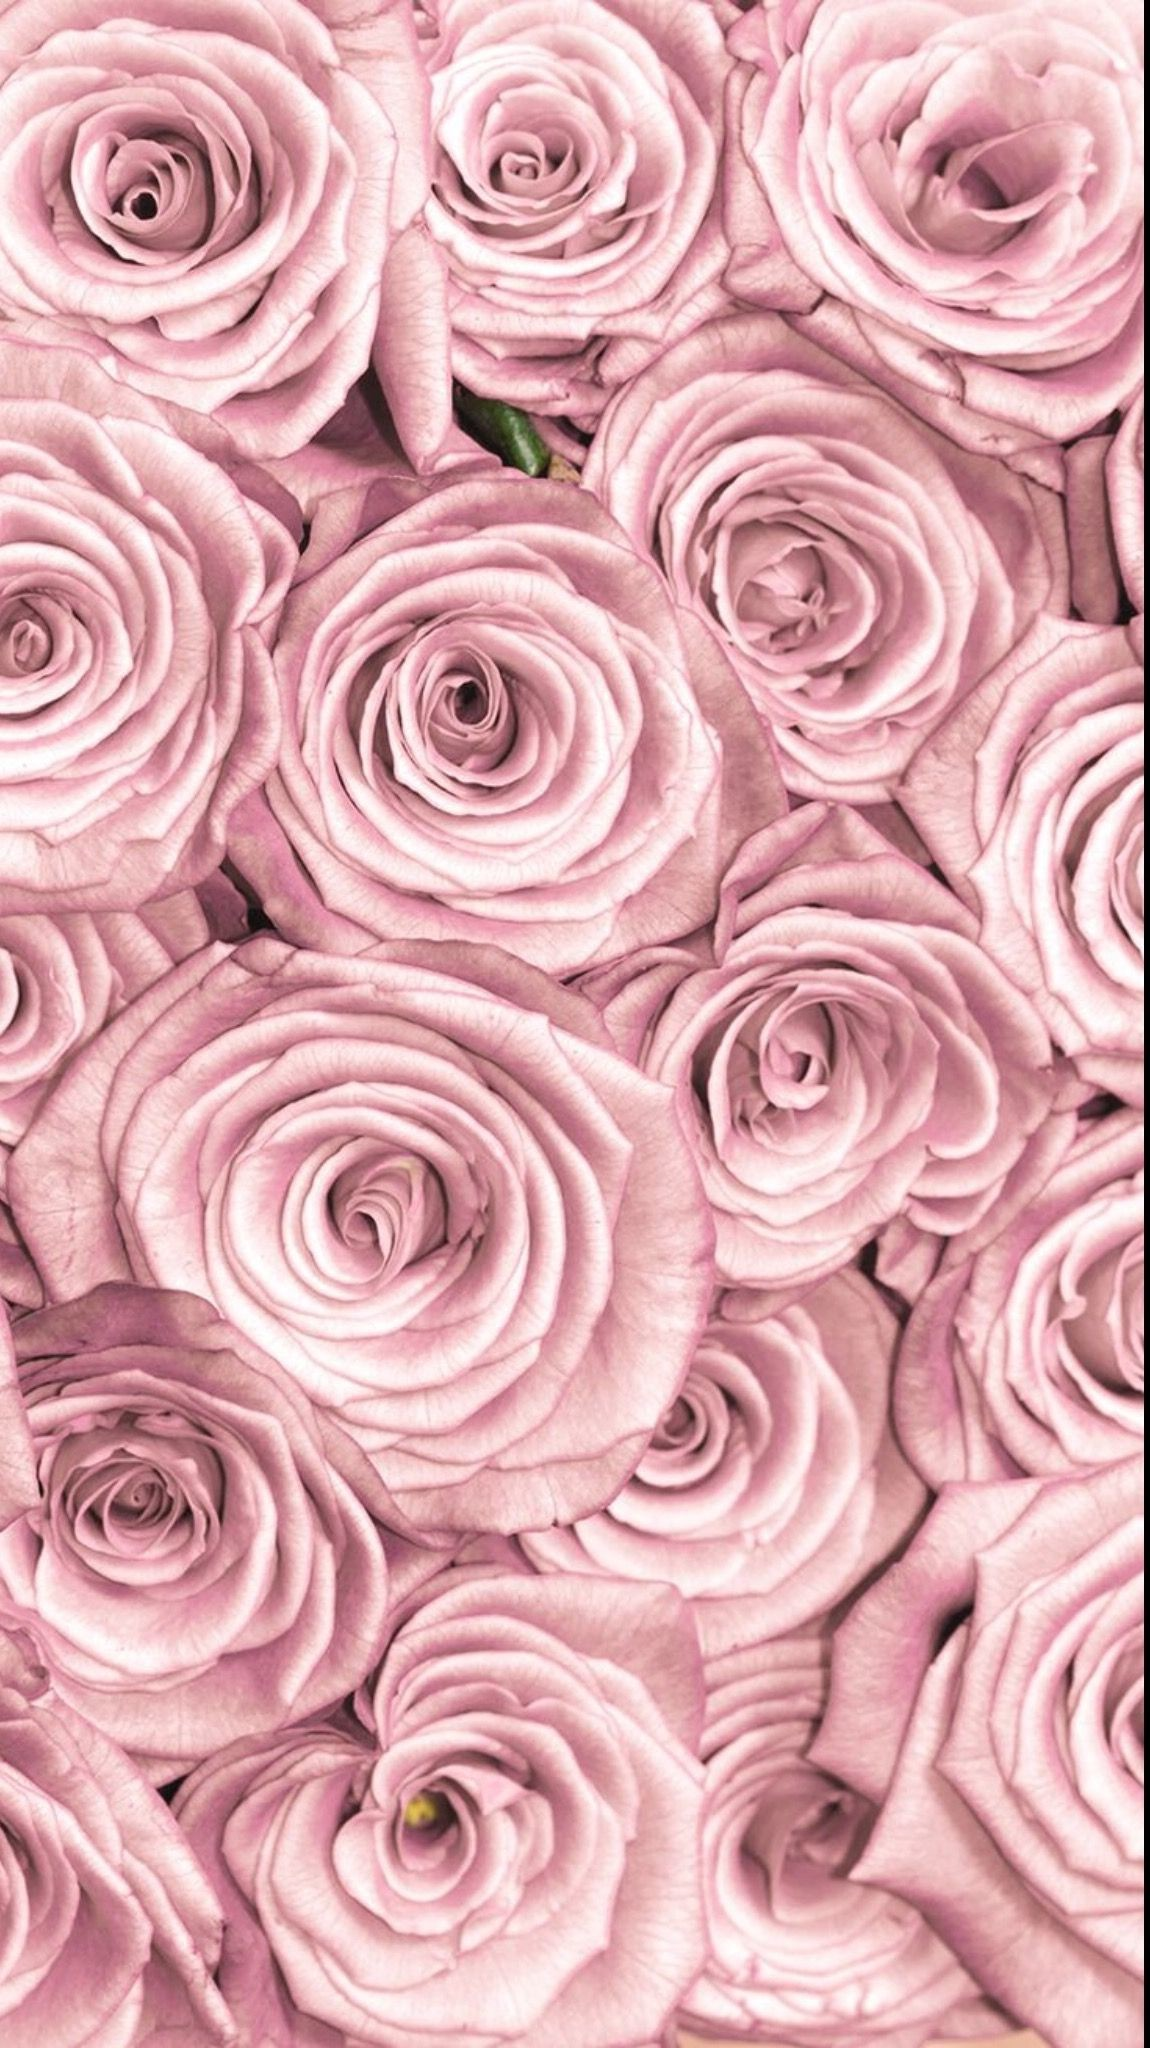 Res: 1150x2048, Flowers lockscreen rose gold